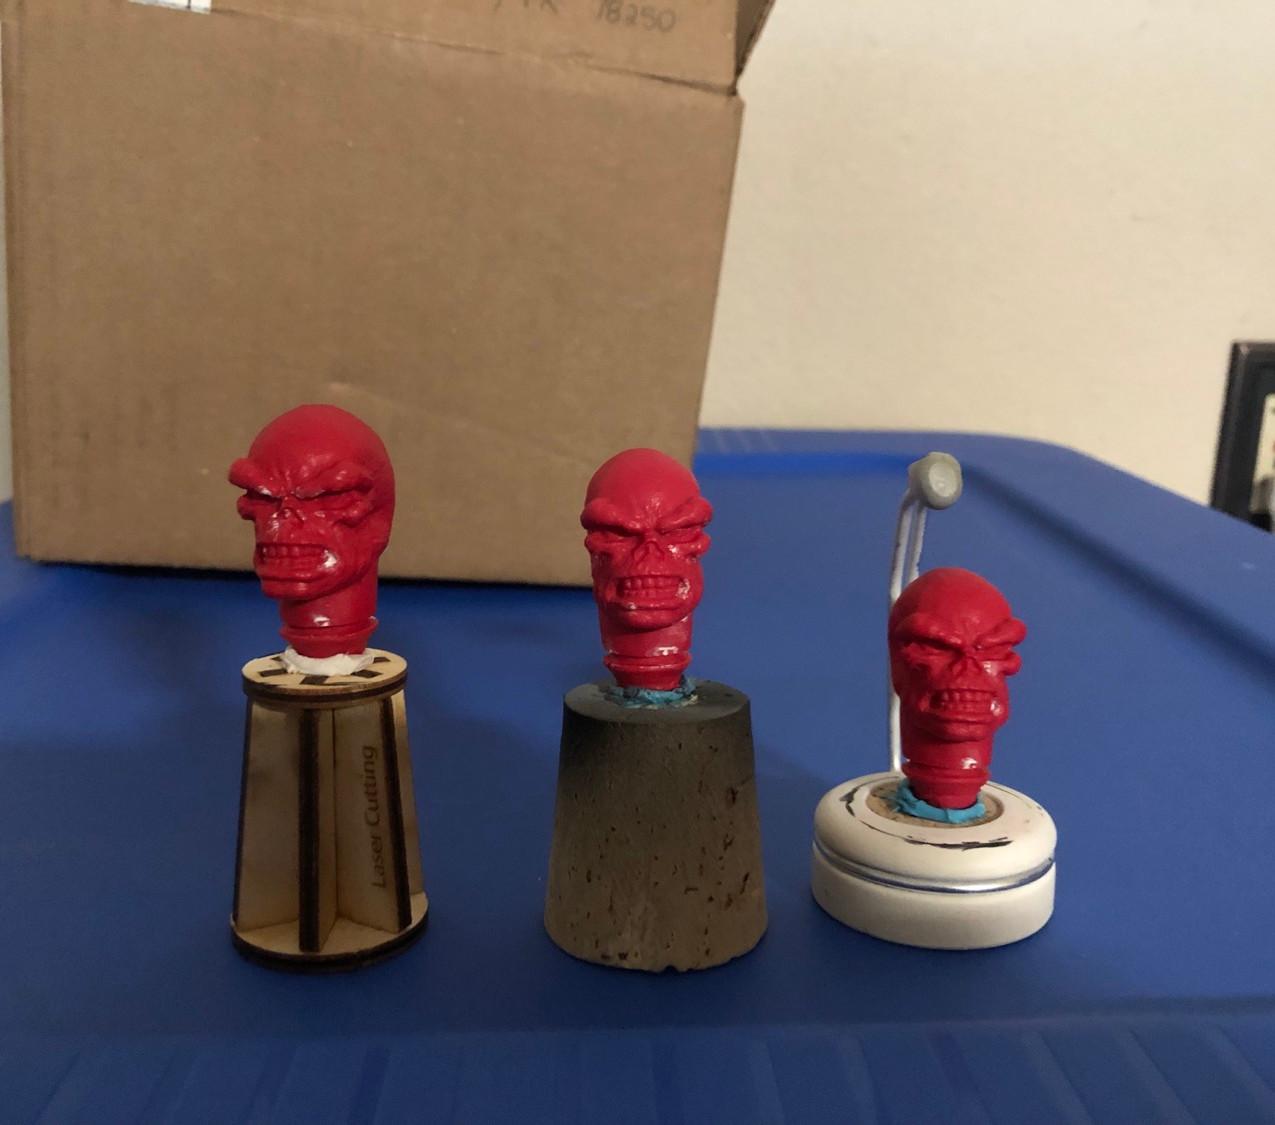 3 Mego heads cleaned